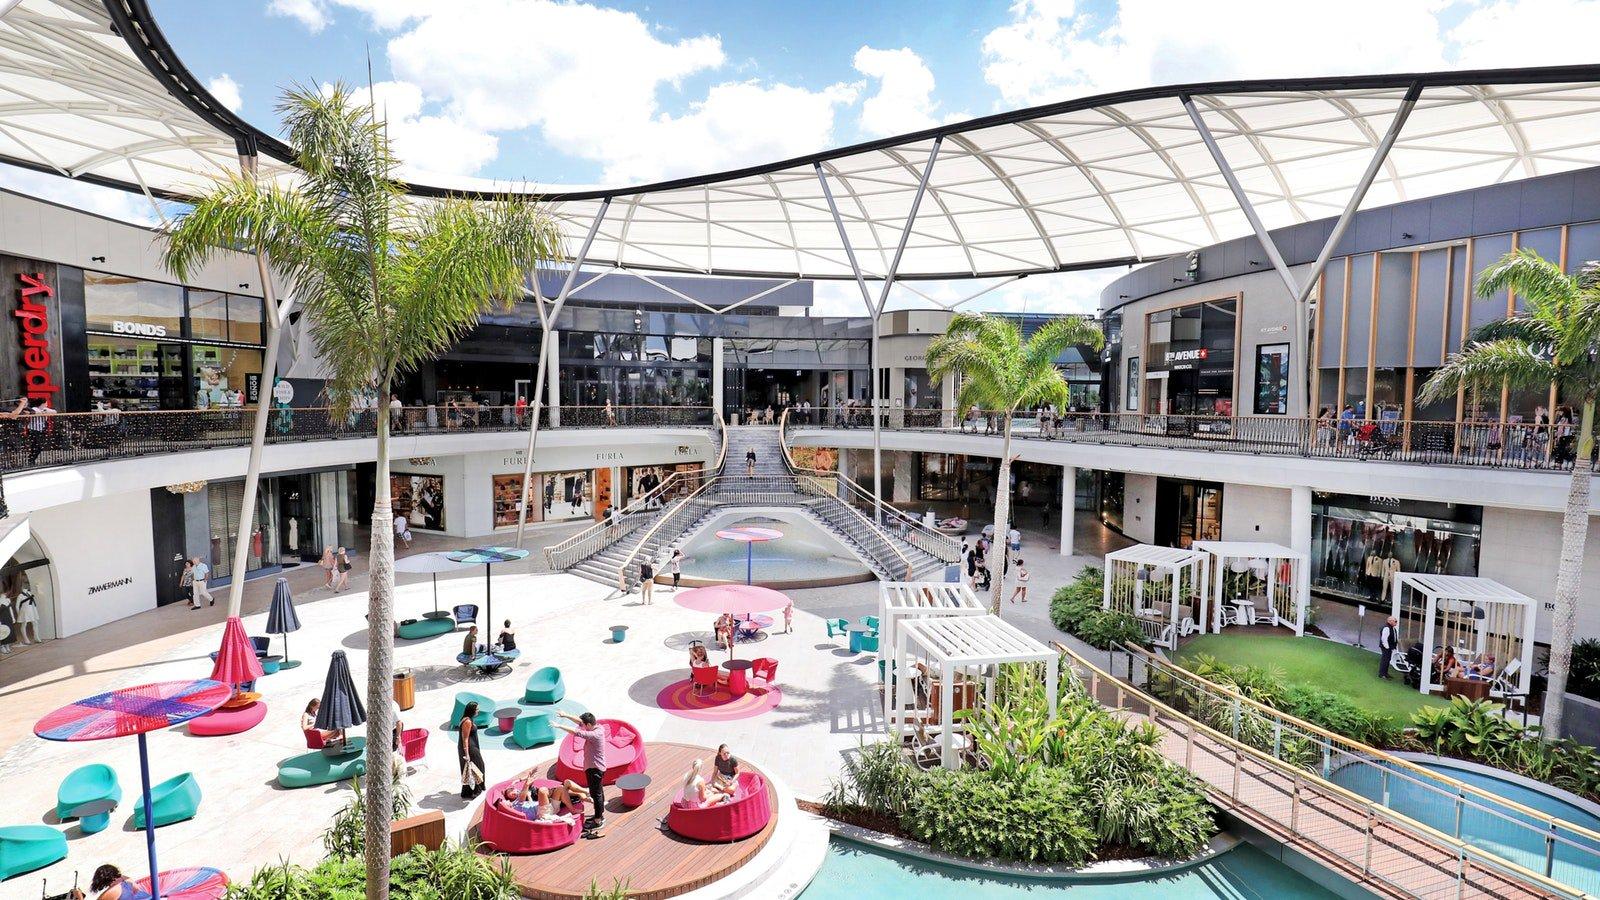 The public space at Pacific Fair, Queensland  image via Destination Gold Coast